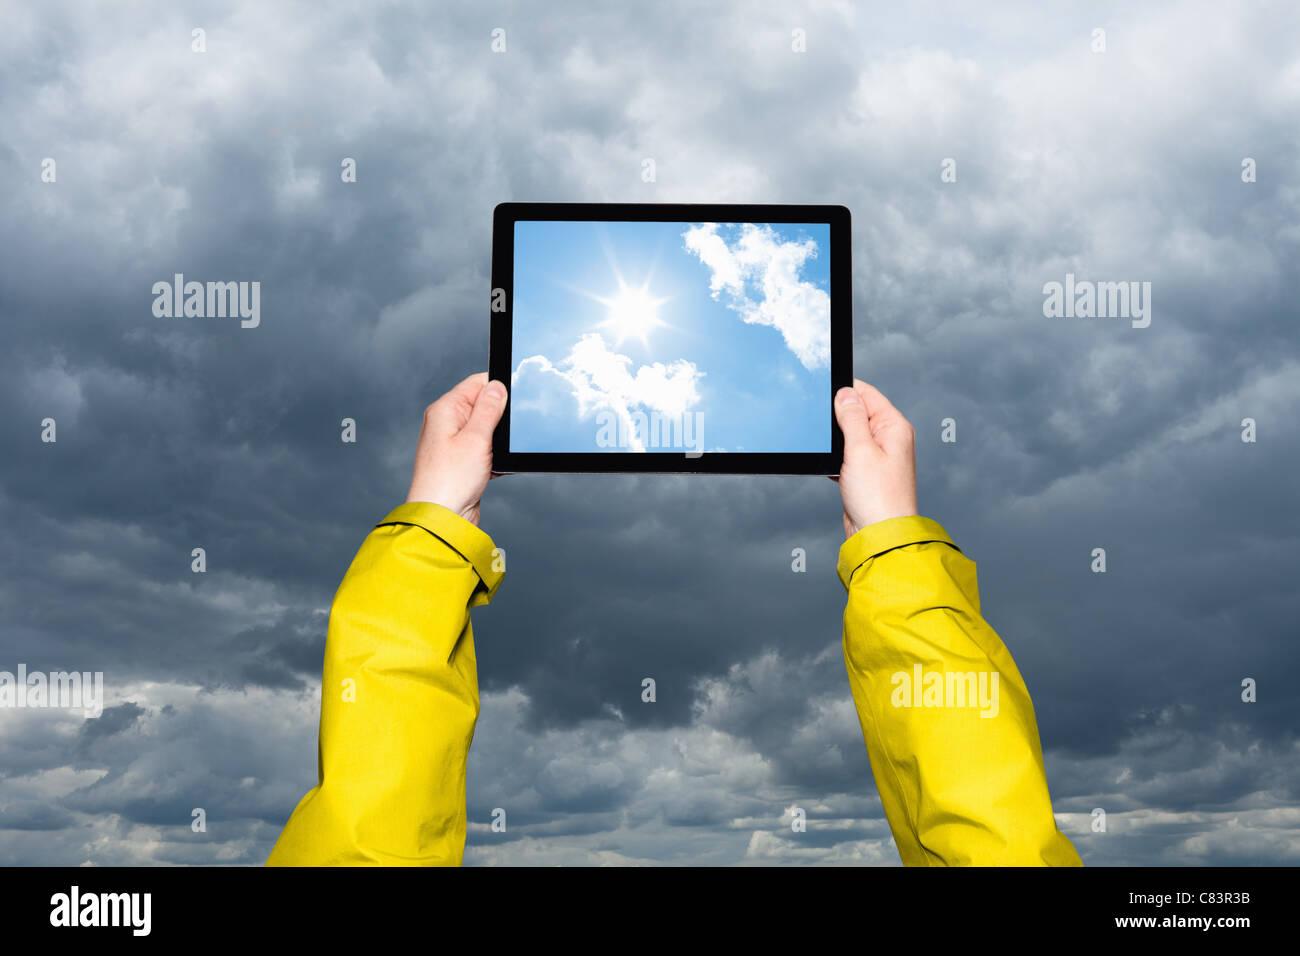 Kind Anzeige Sturm auf dem Tablet PC Stockbild